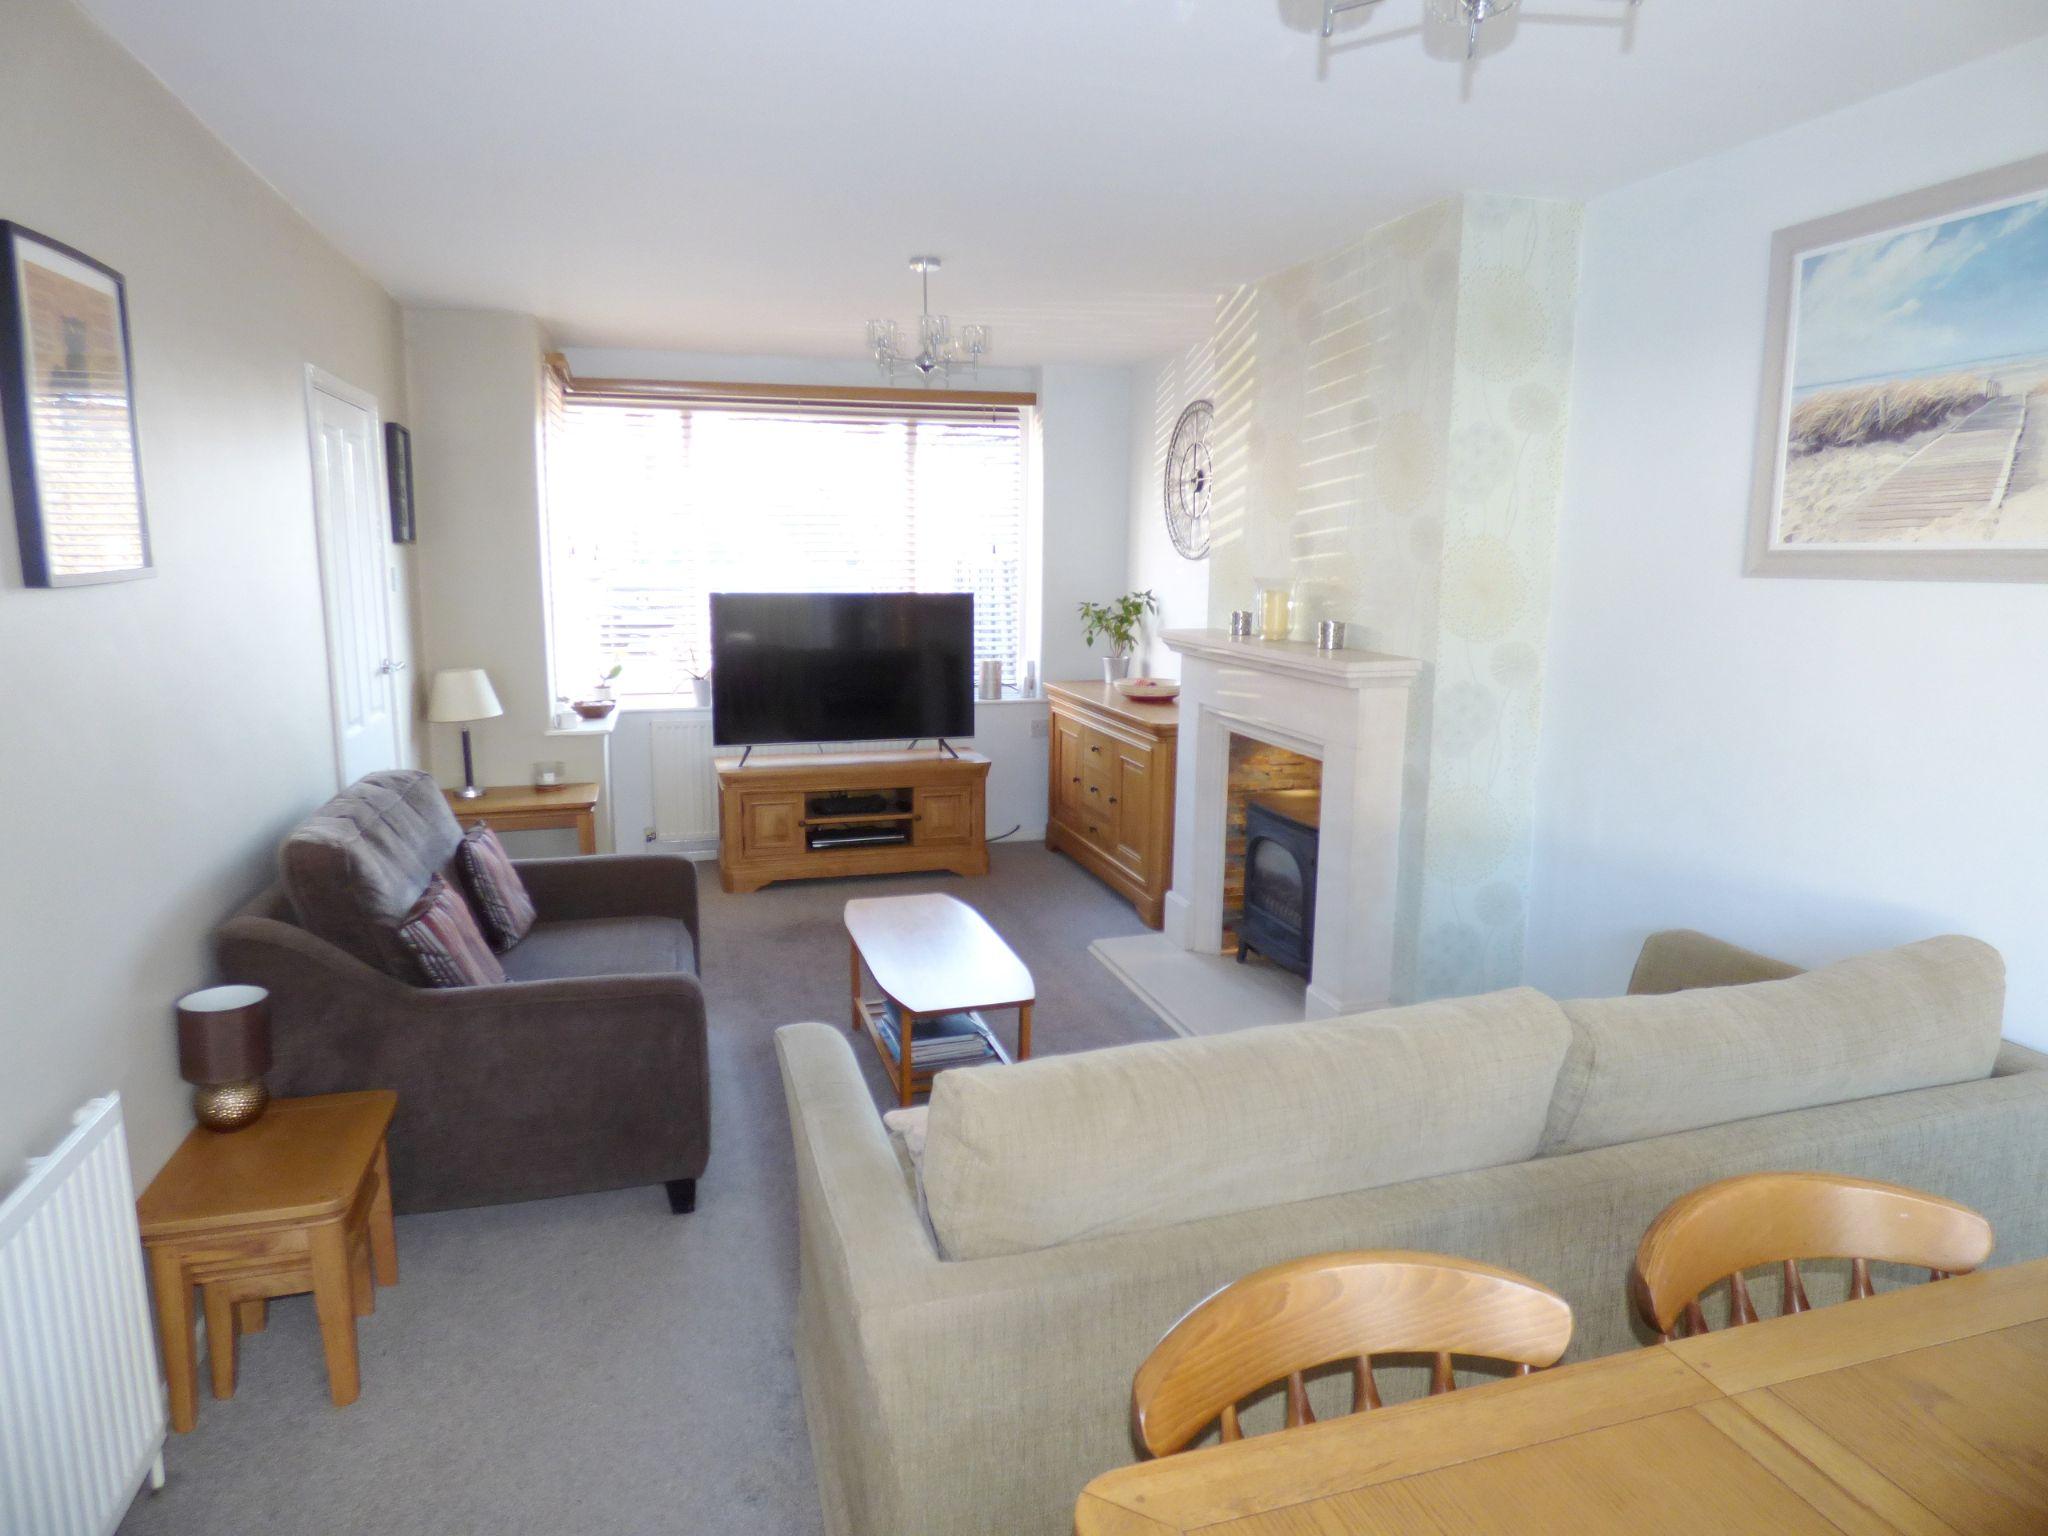 3 Bedroom Semi-detached House For Sale - Living Room